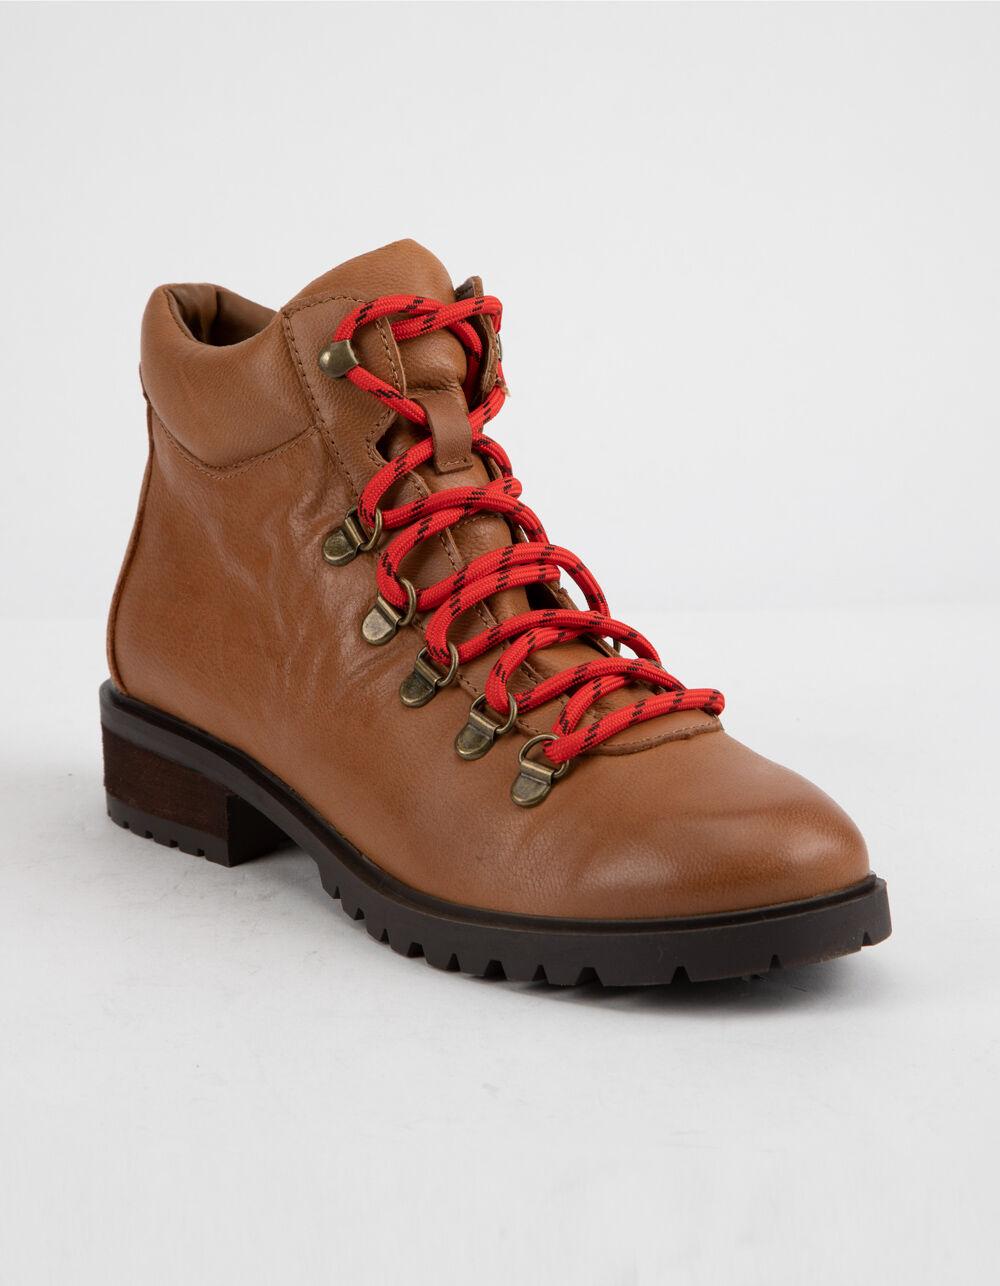 STEVE MADDEN Lora Cognac Leather Combat Boots